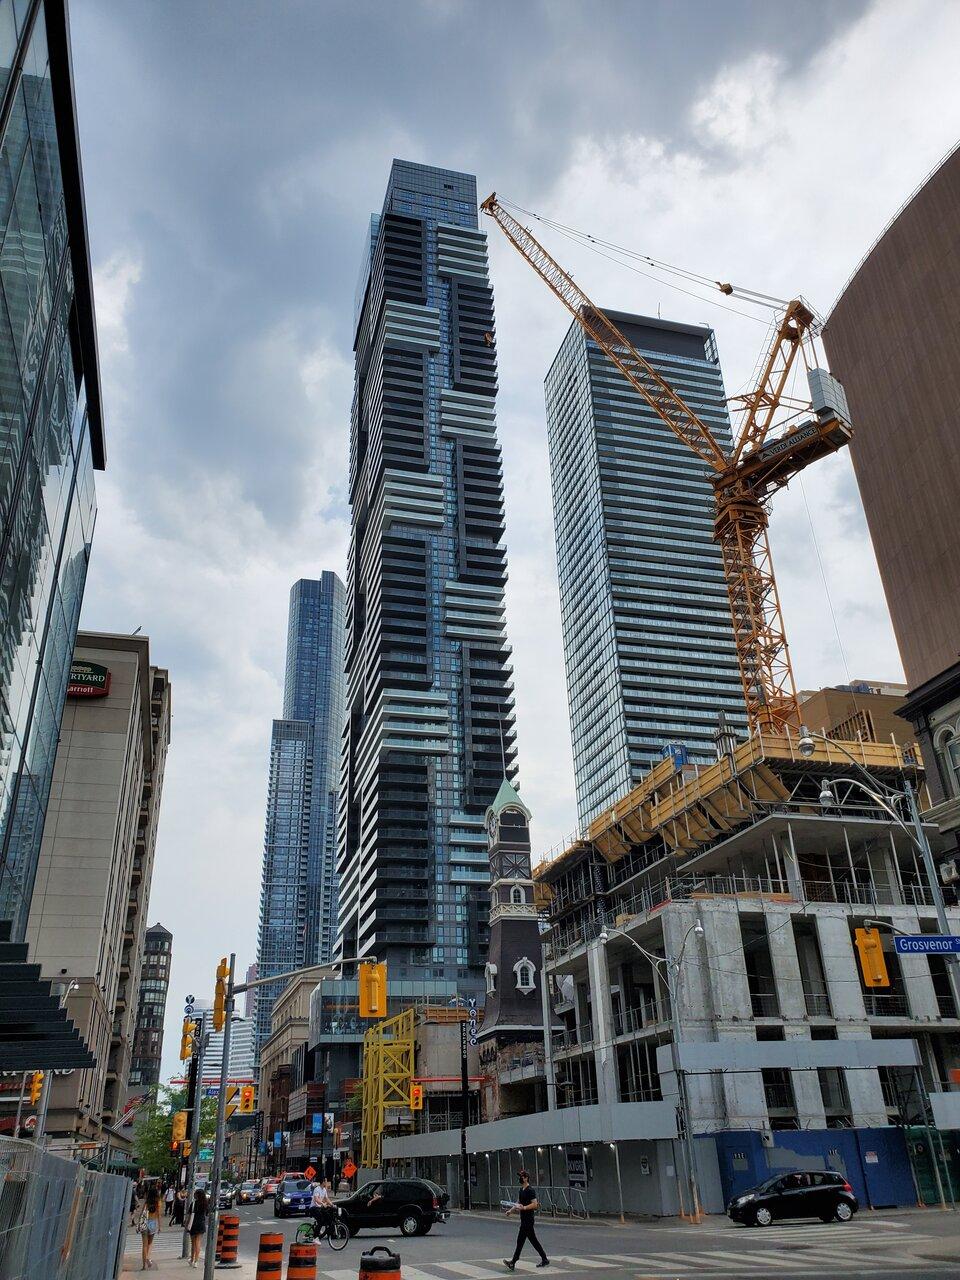 Halo Residences on Yonge, Quadreal Property Group, architects—Alliance, Toronto